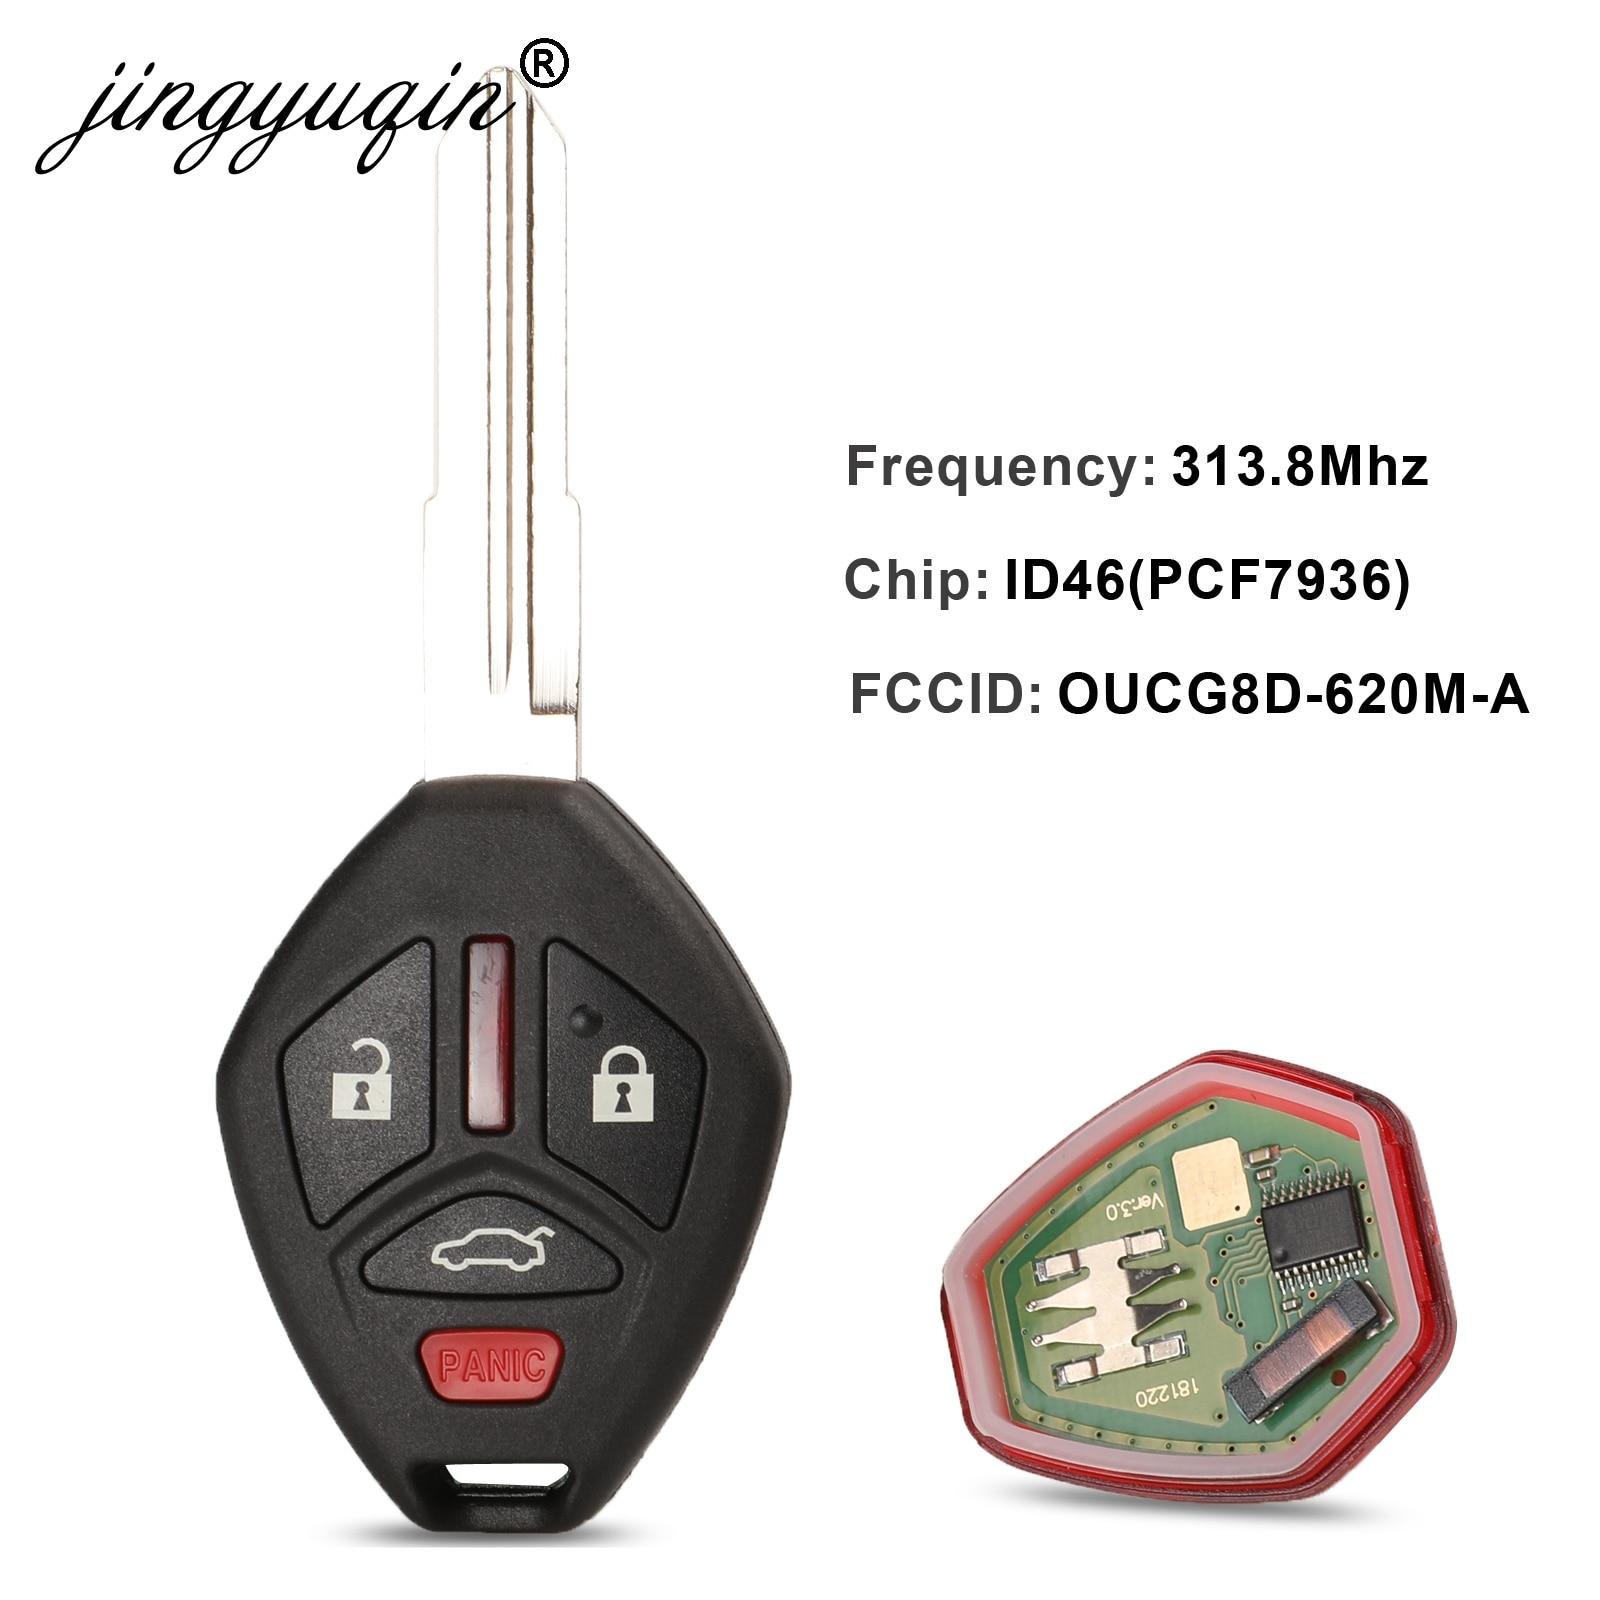 Jingyuqin 5 unids/lote Chip transpondedor ID46 para Mitsubishi OUCG8D-620M-A 313,8 Mhz para Galant Eclipse 2007-2012